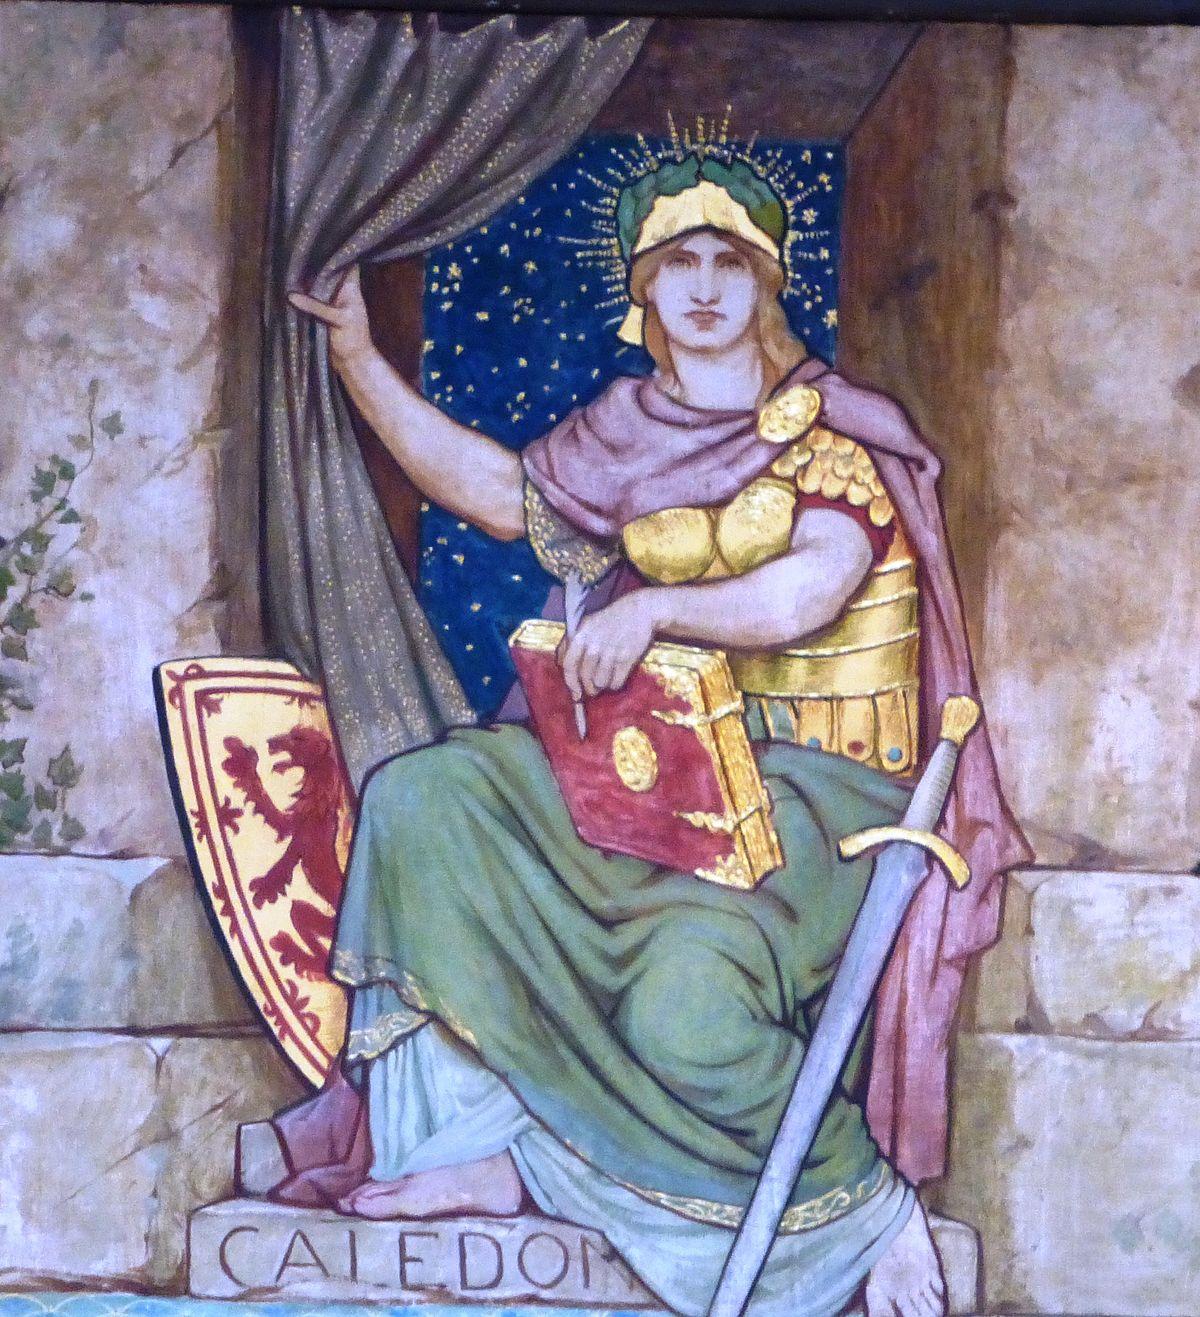 Caledonia wikipedia for The caledonia